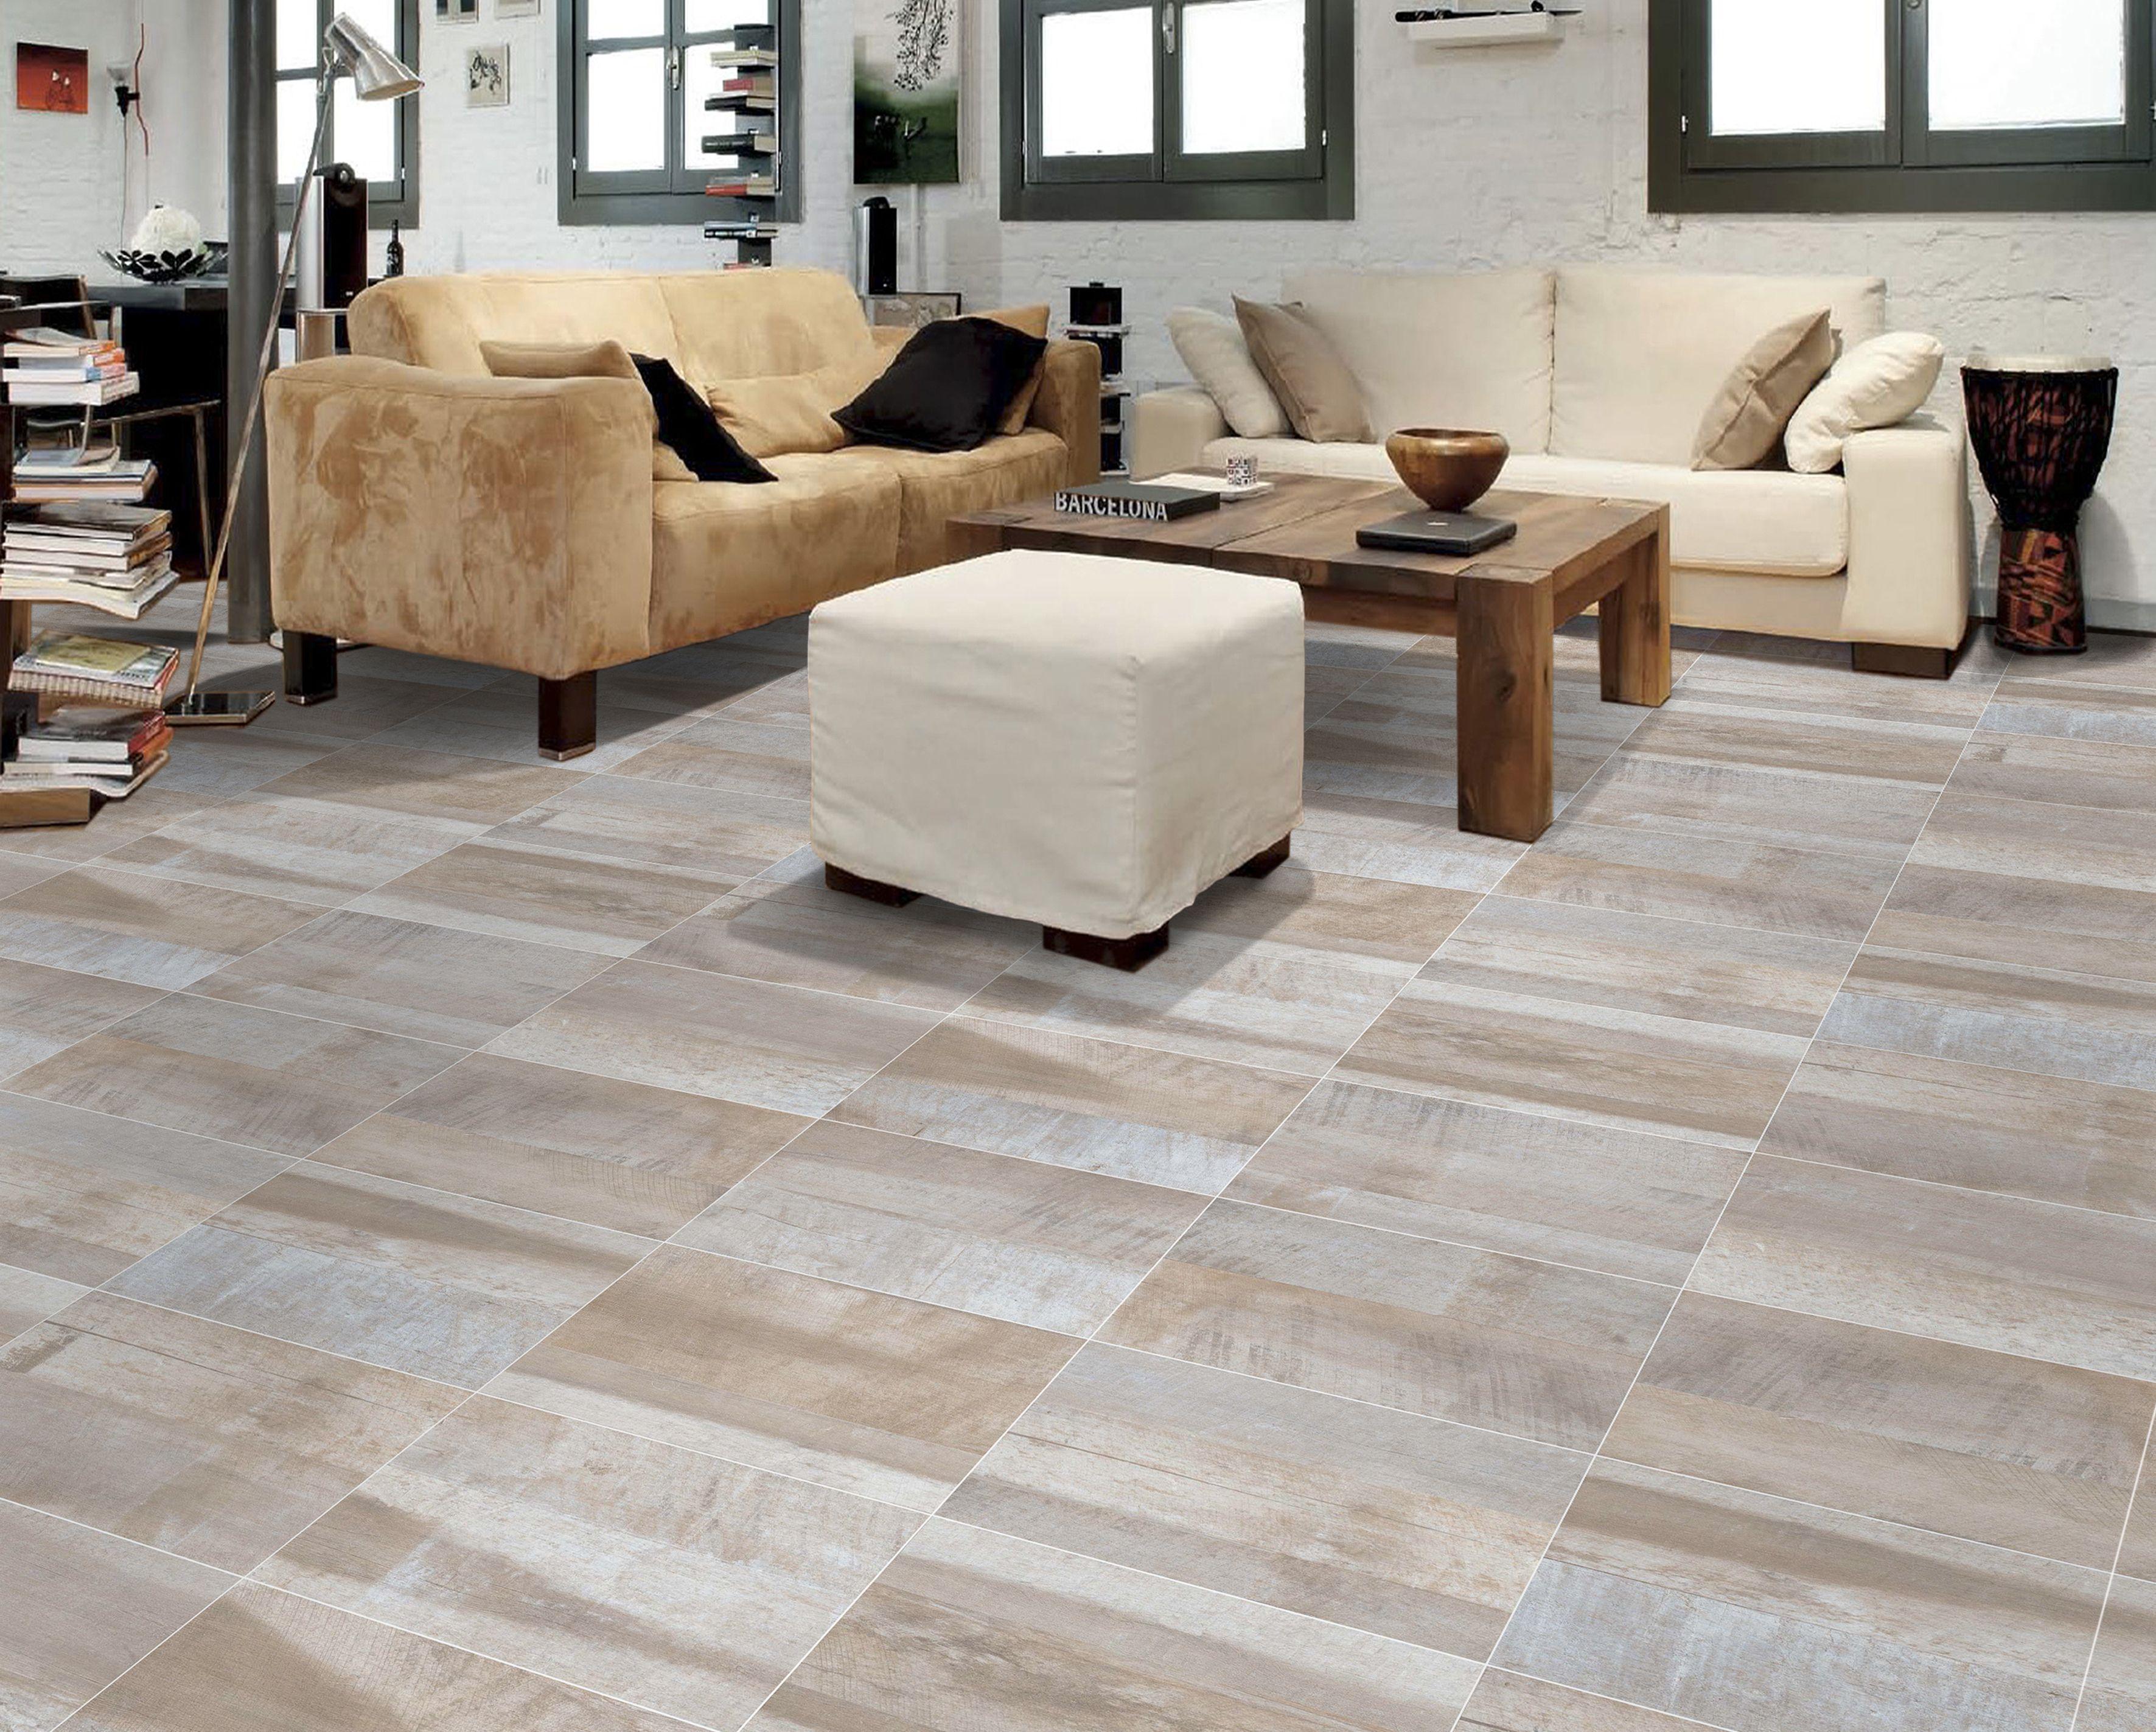 Stunning Timber Look Tiles 300x600 Internal And External Available